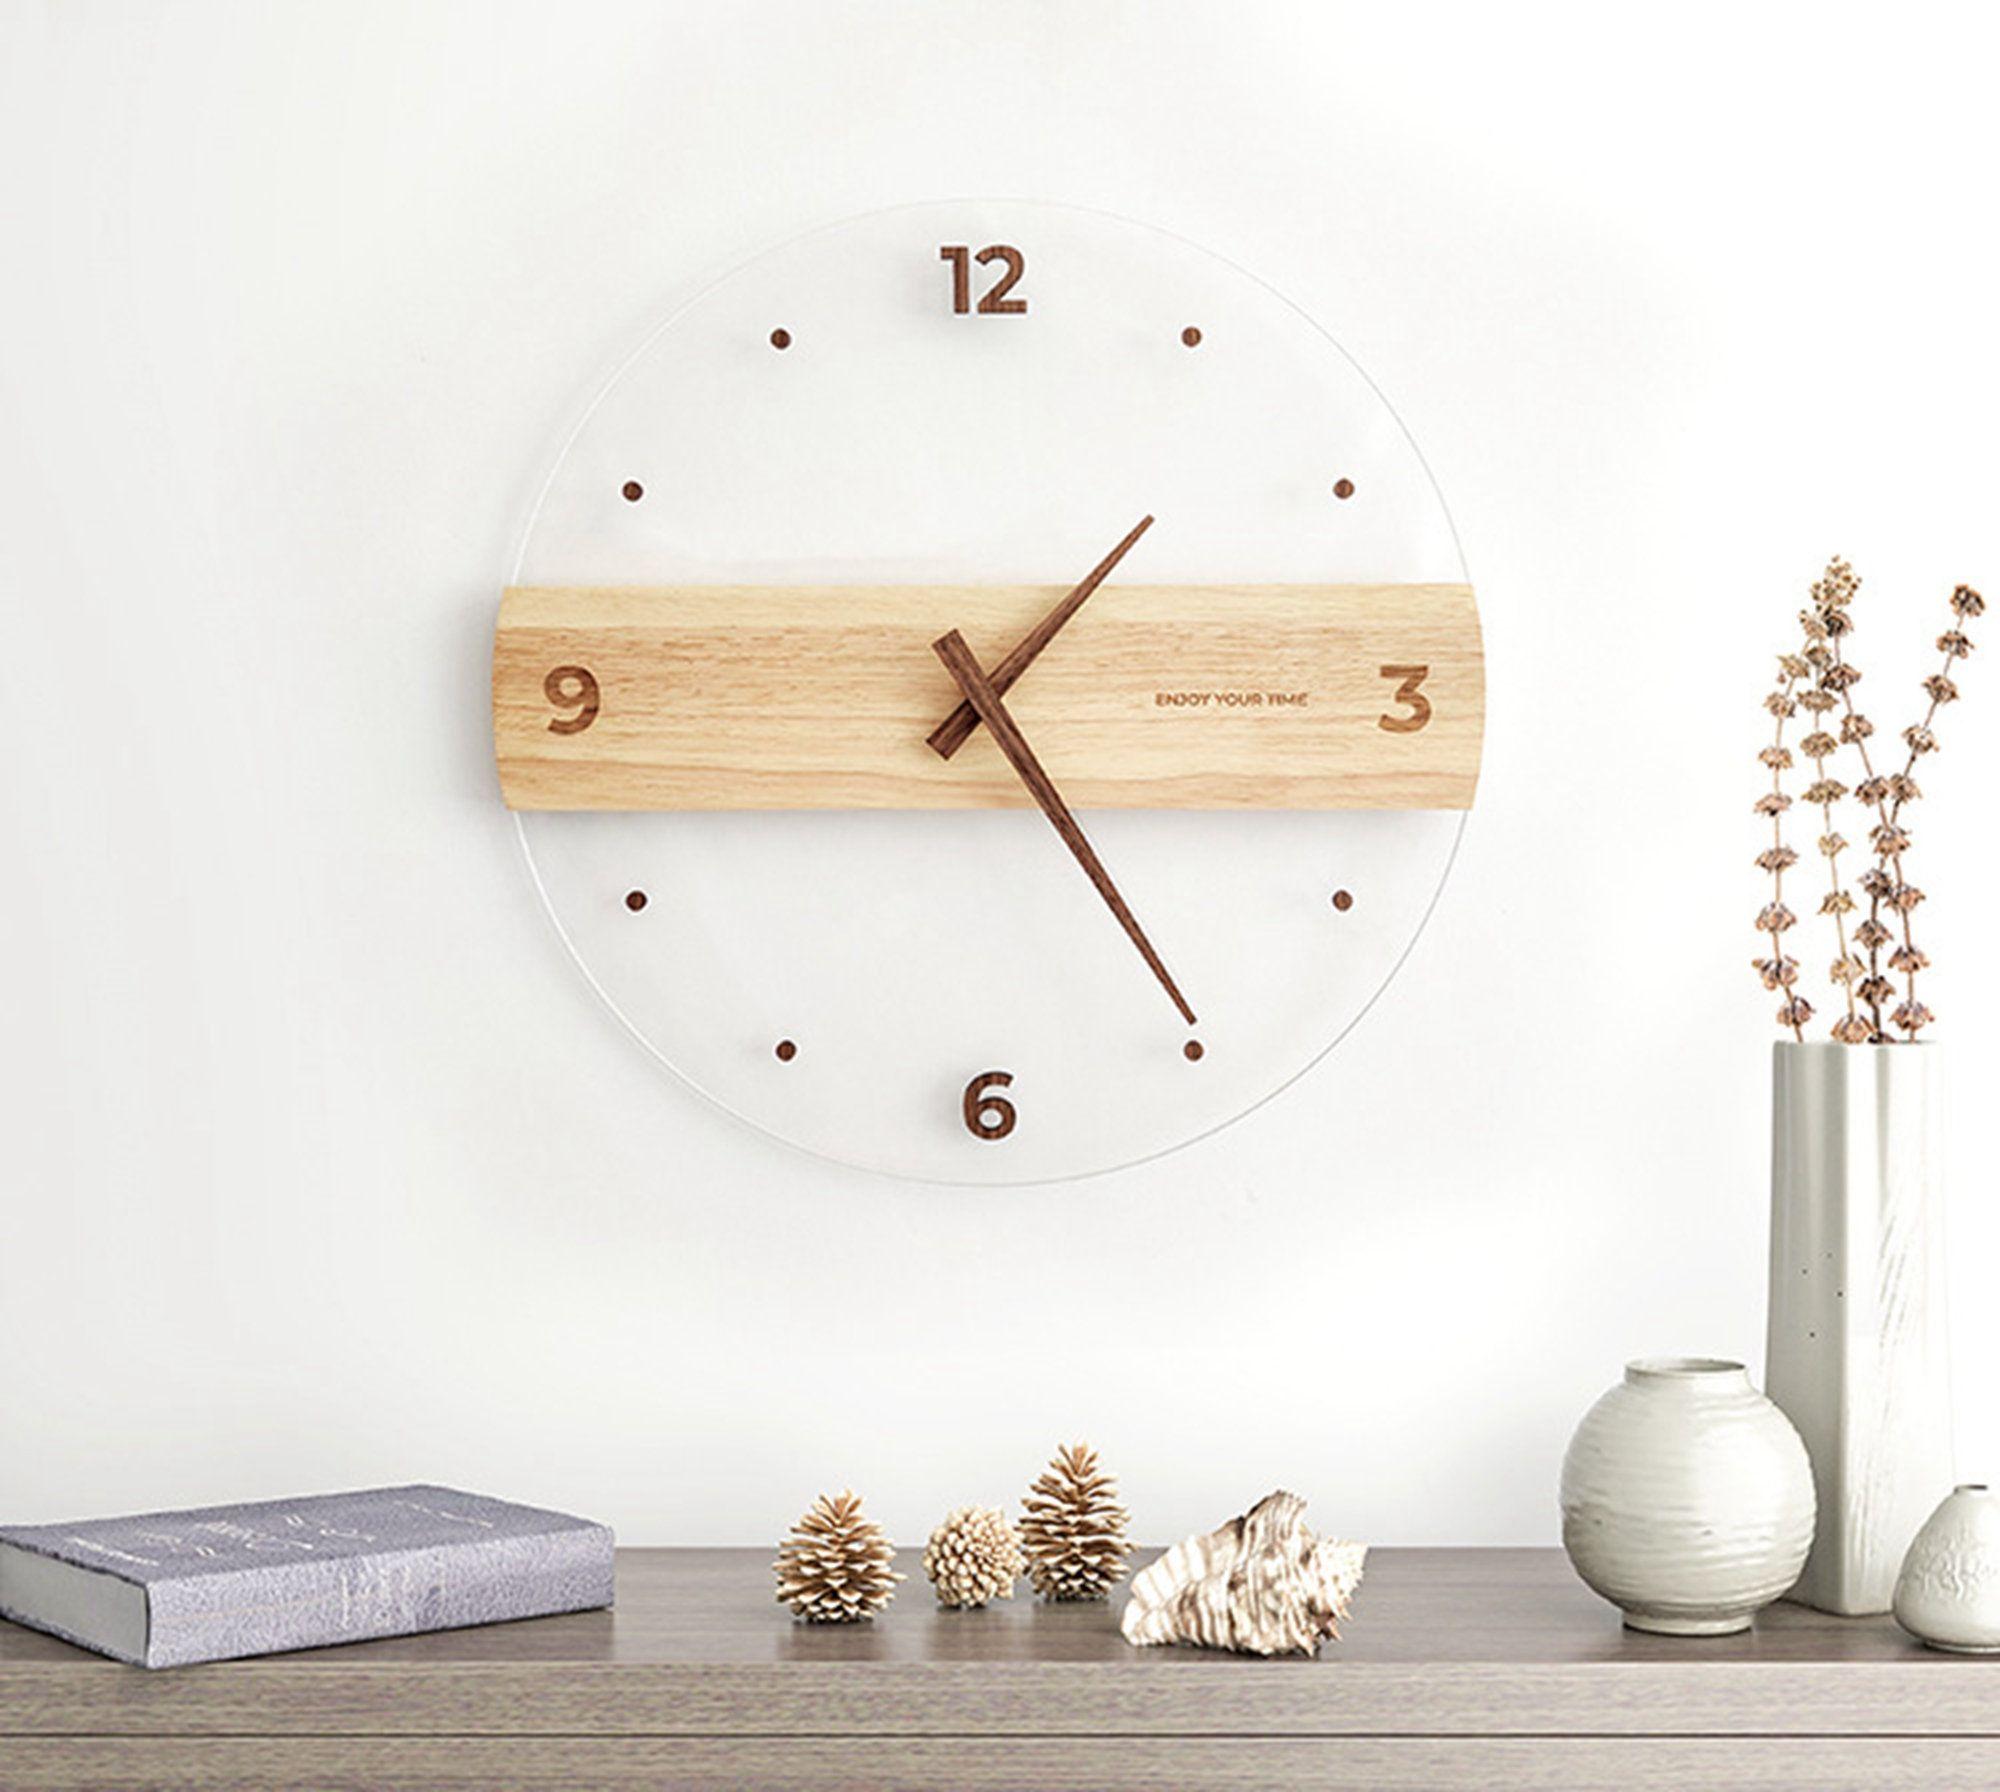 Large Modern Wood Wall Clock Decor Round Wooden Silent Clock Etsy In 2021 Wall Clocks Living Room Wood Wall Clock Clock Wall Decor Decorative kitchen wall clocks